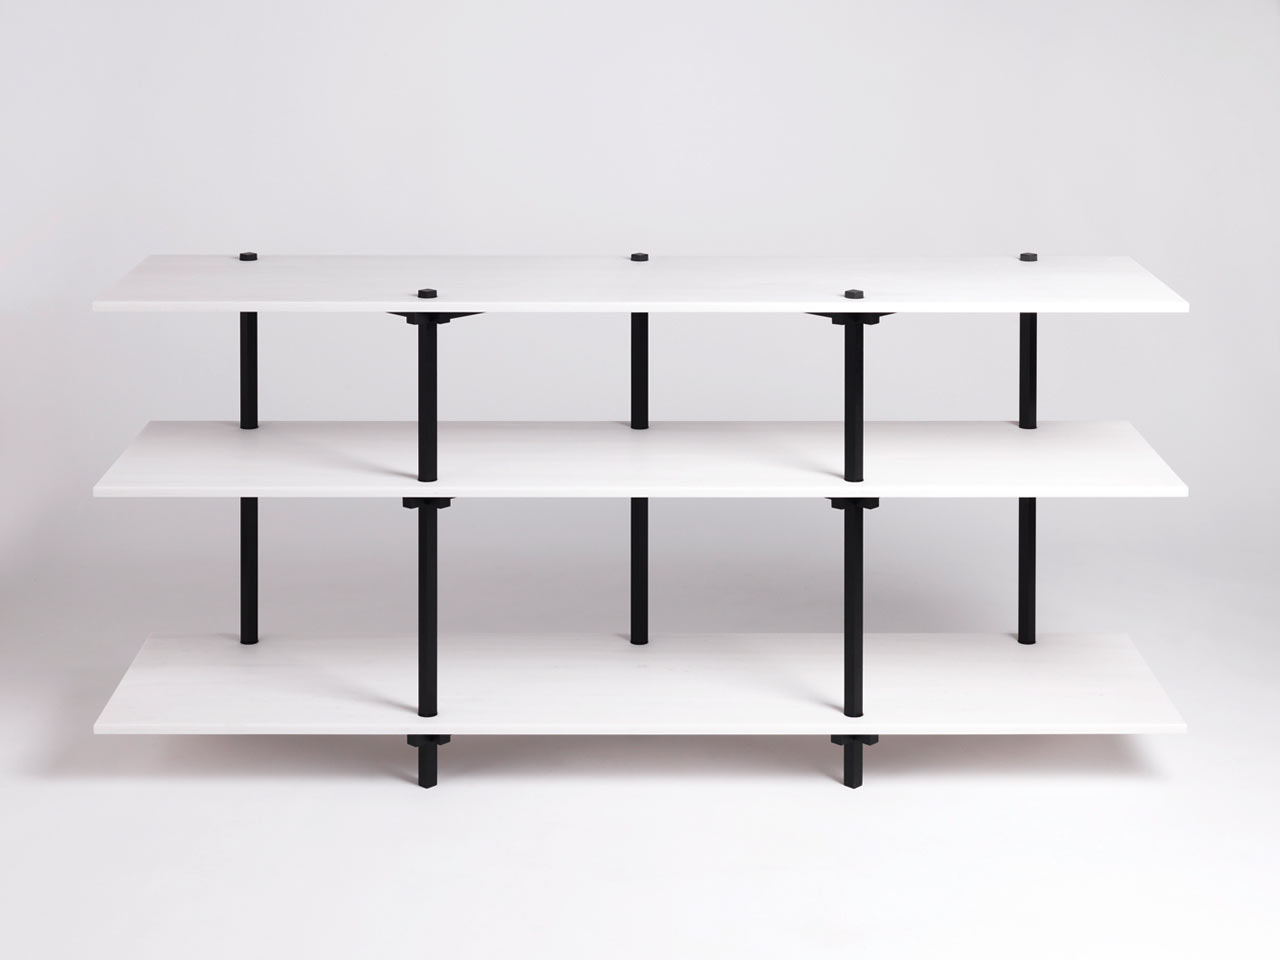 Creative Furniture Inspired by M.C. Escher